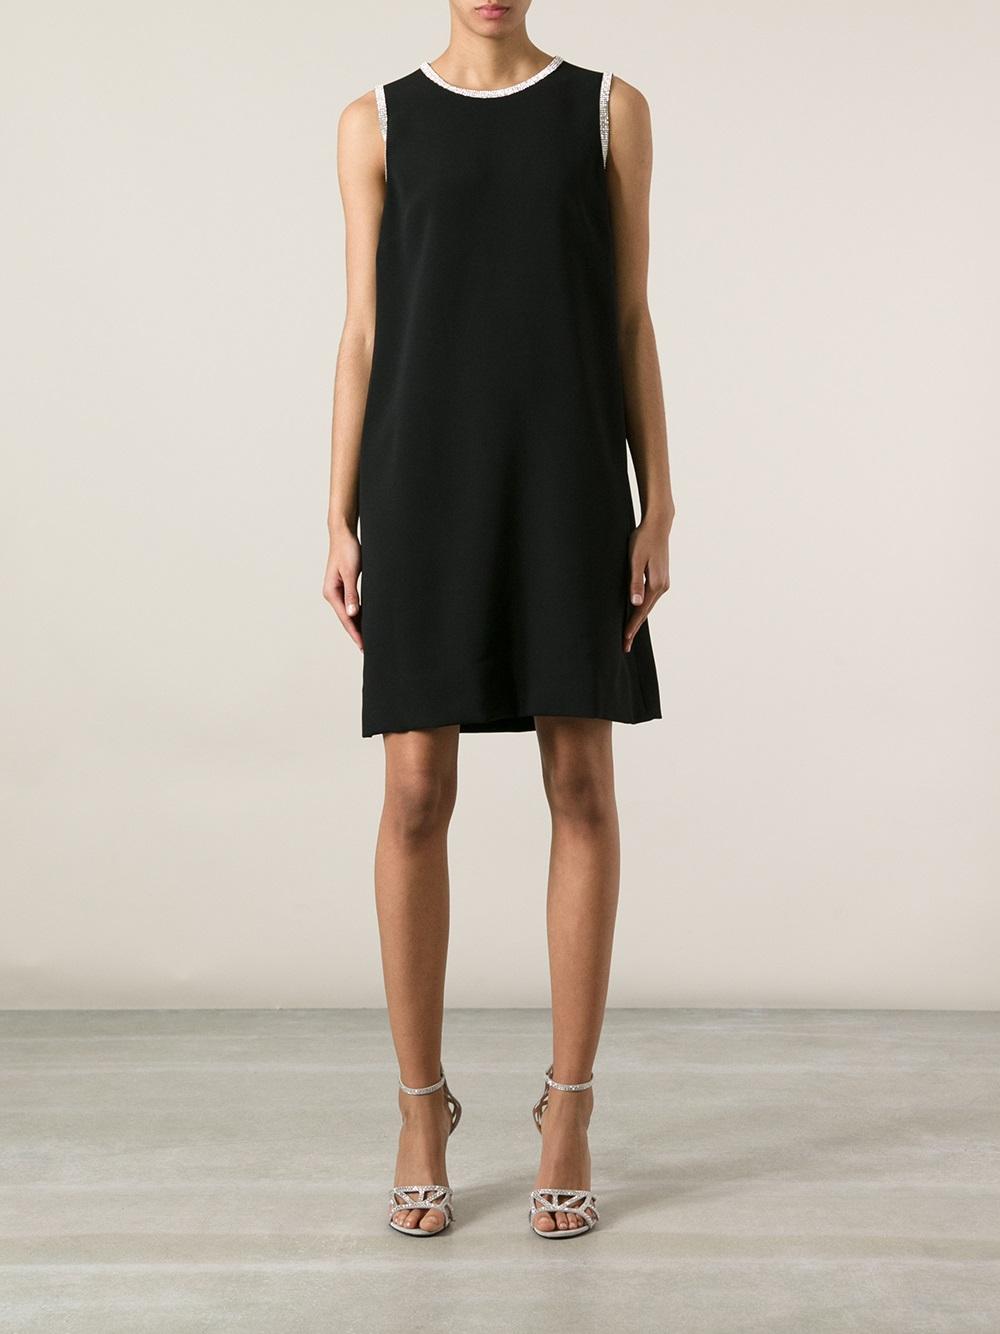 Dolce & gabbana Sleeveless Shift Dress in Black | Lyst